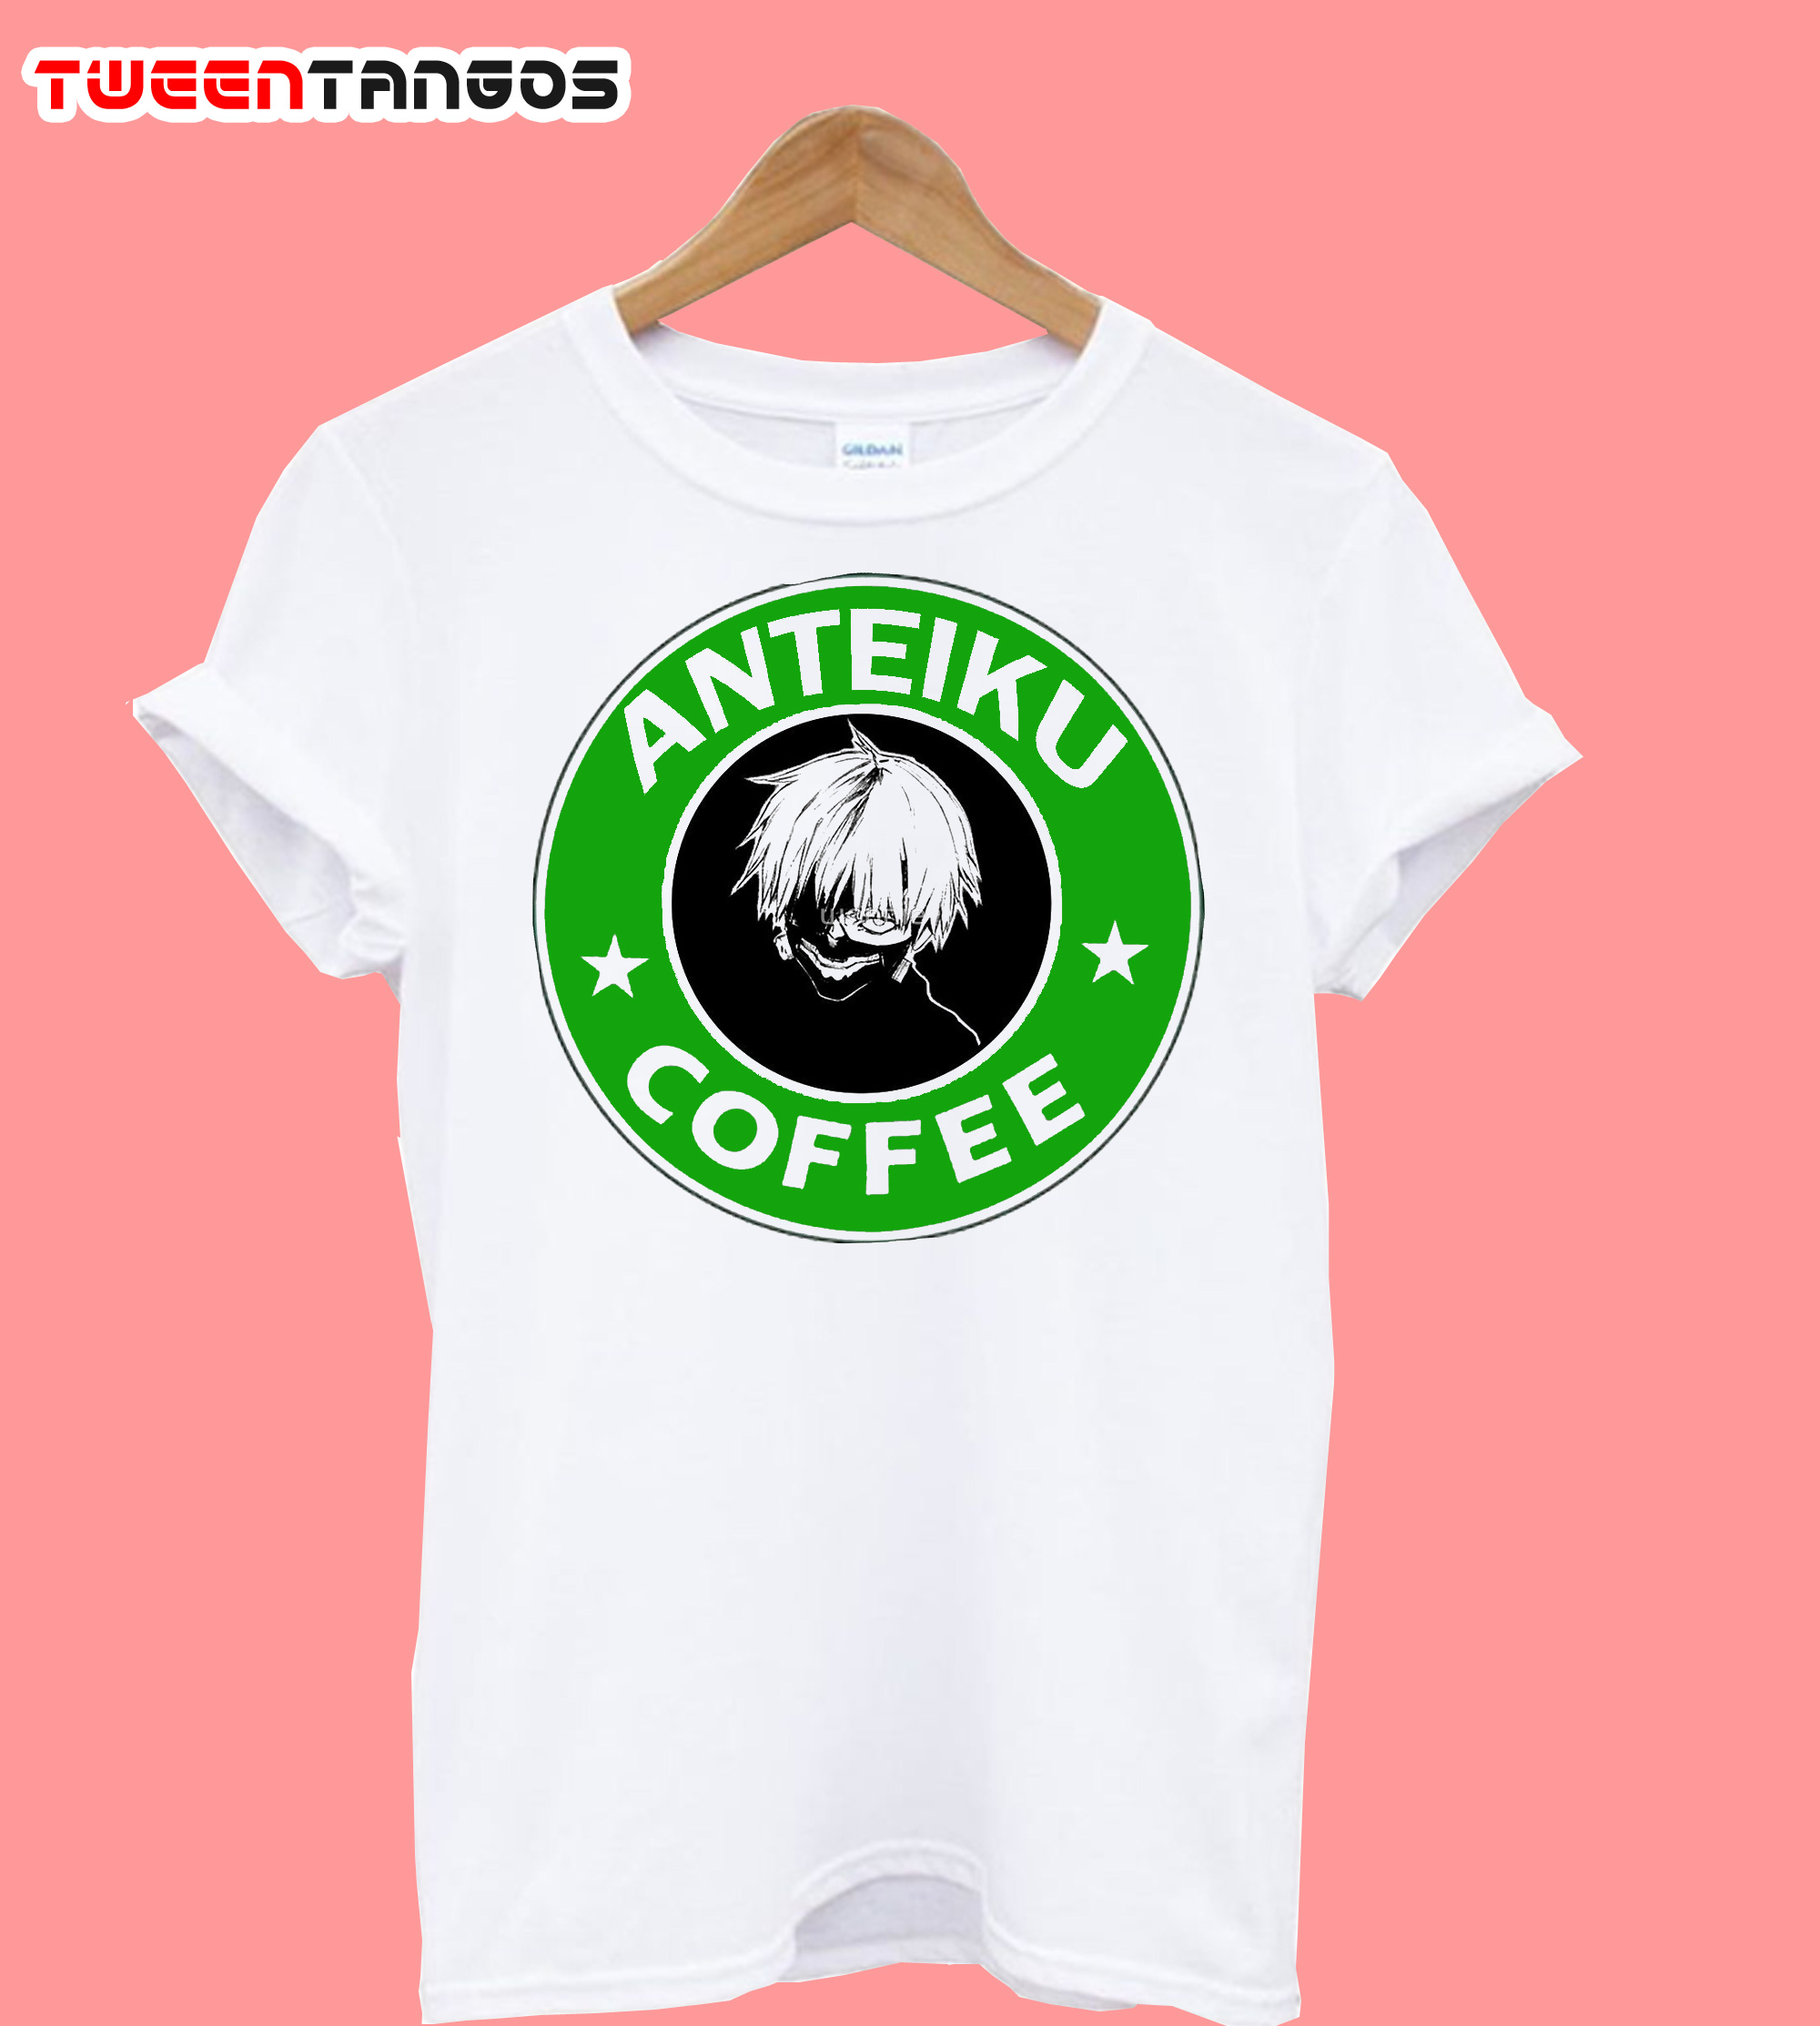 Tokyo Ghuol Anteiku Coffee T-Shirt